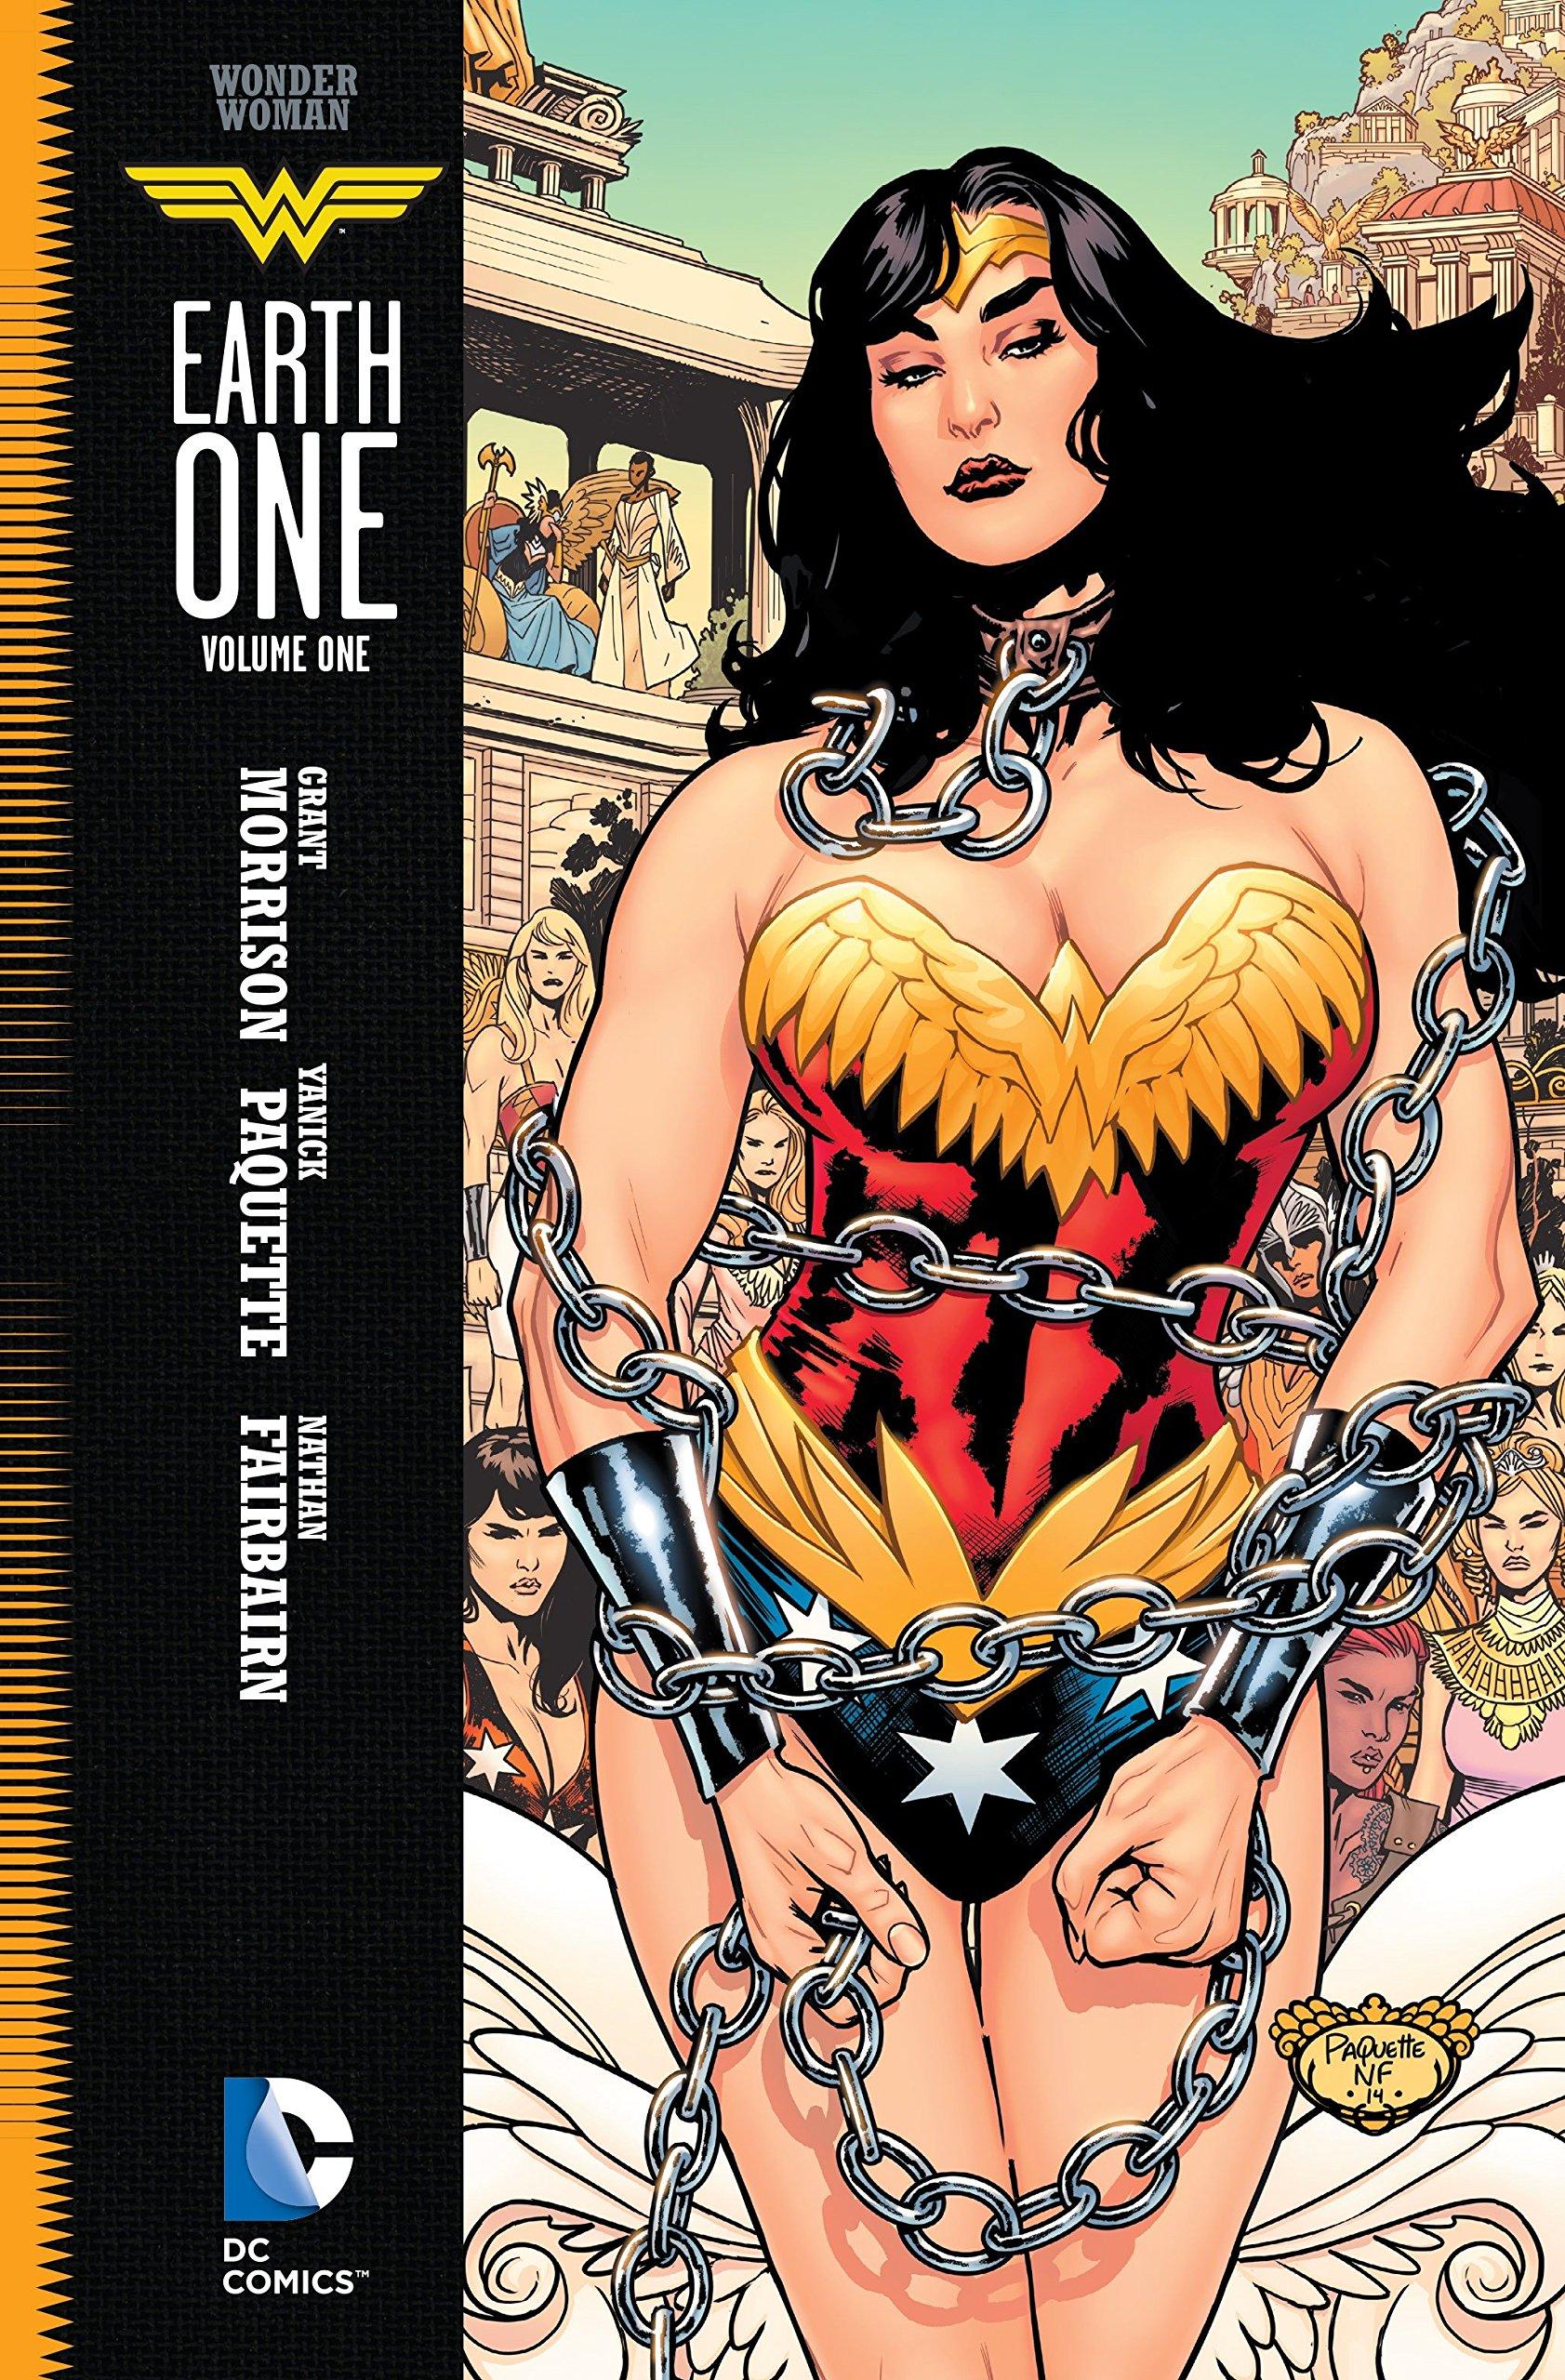 eca0cad5 Wonder Woman: Earth One Vol. 1: Grant Morrison, Yanick Paquette ...